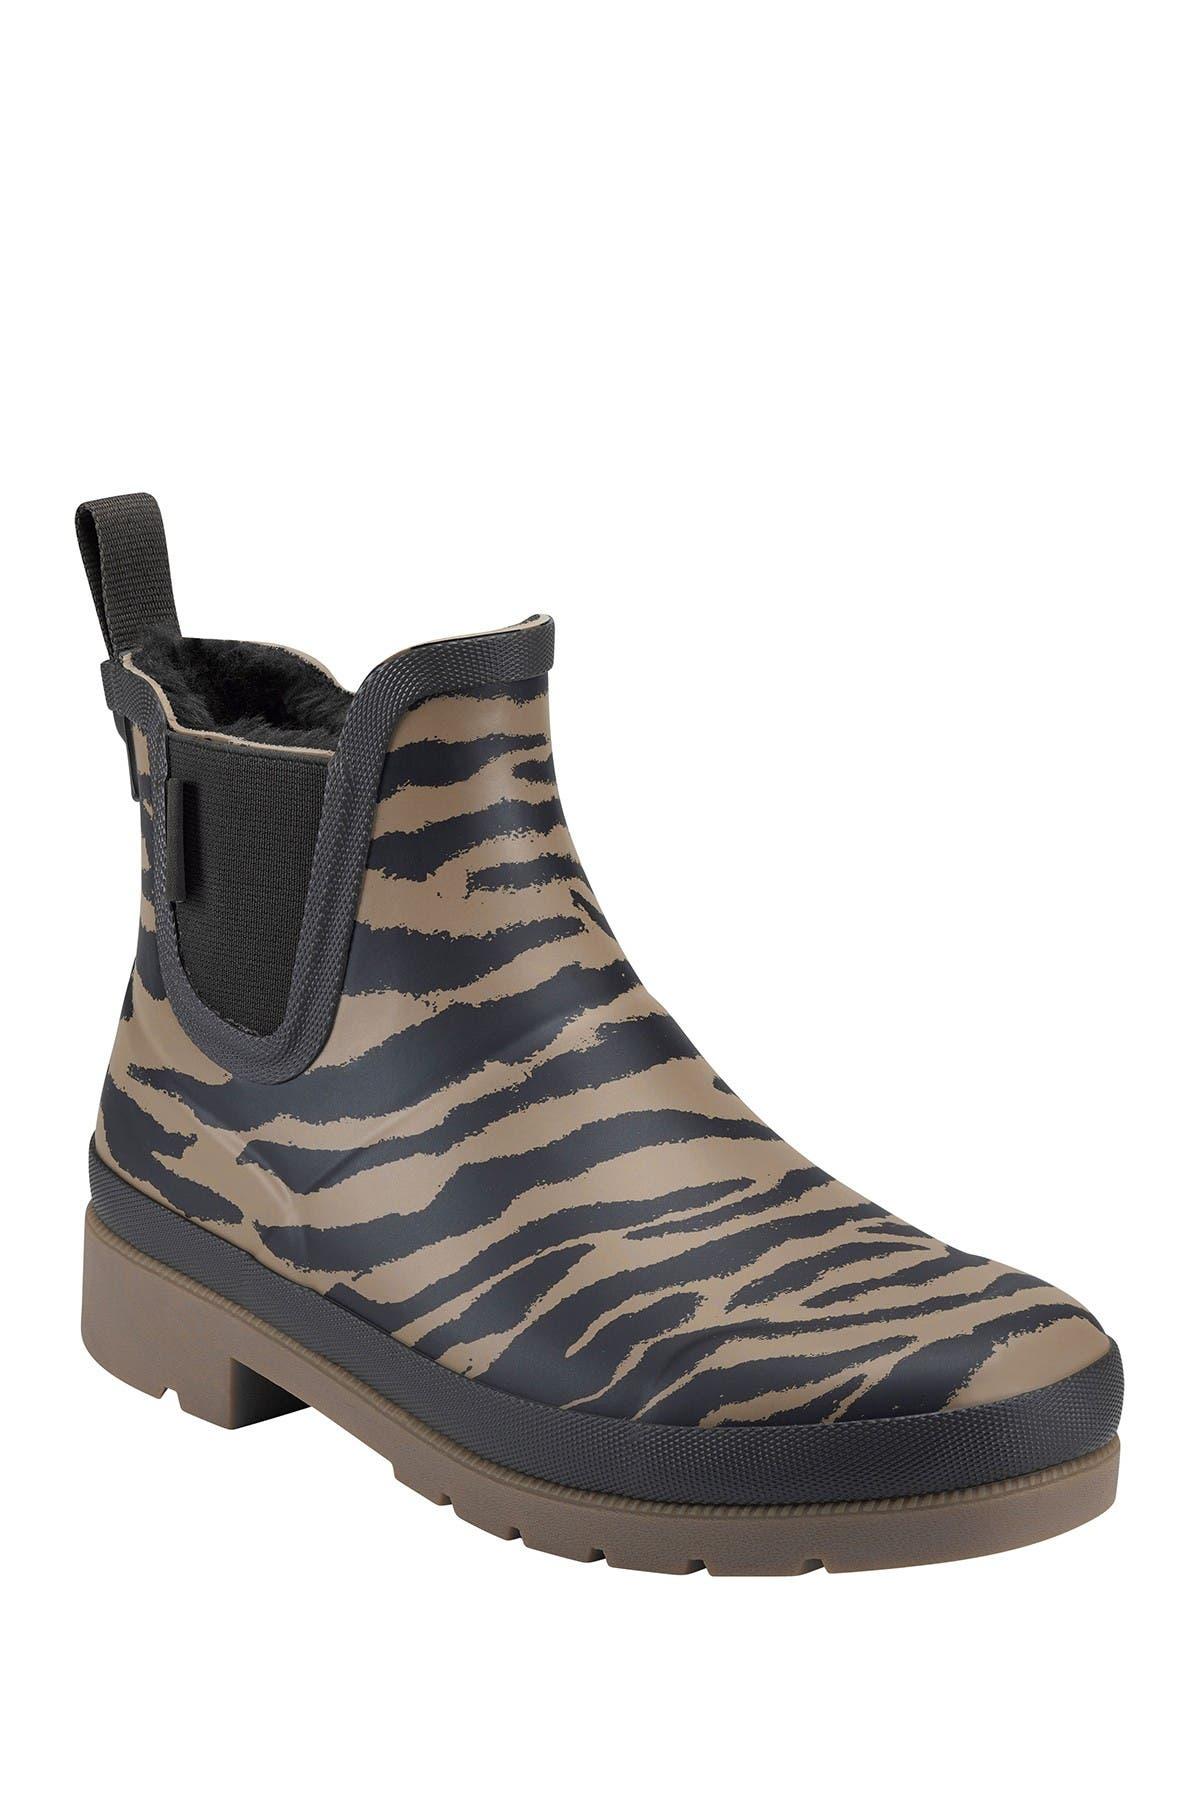 Image of Tretorn Lina 2 Faux Shearling Lined Rain Boot